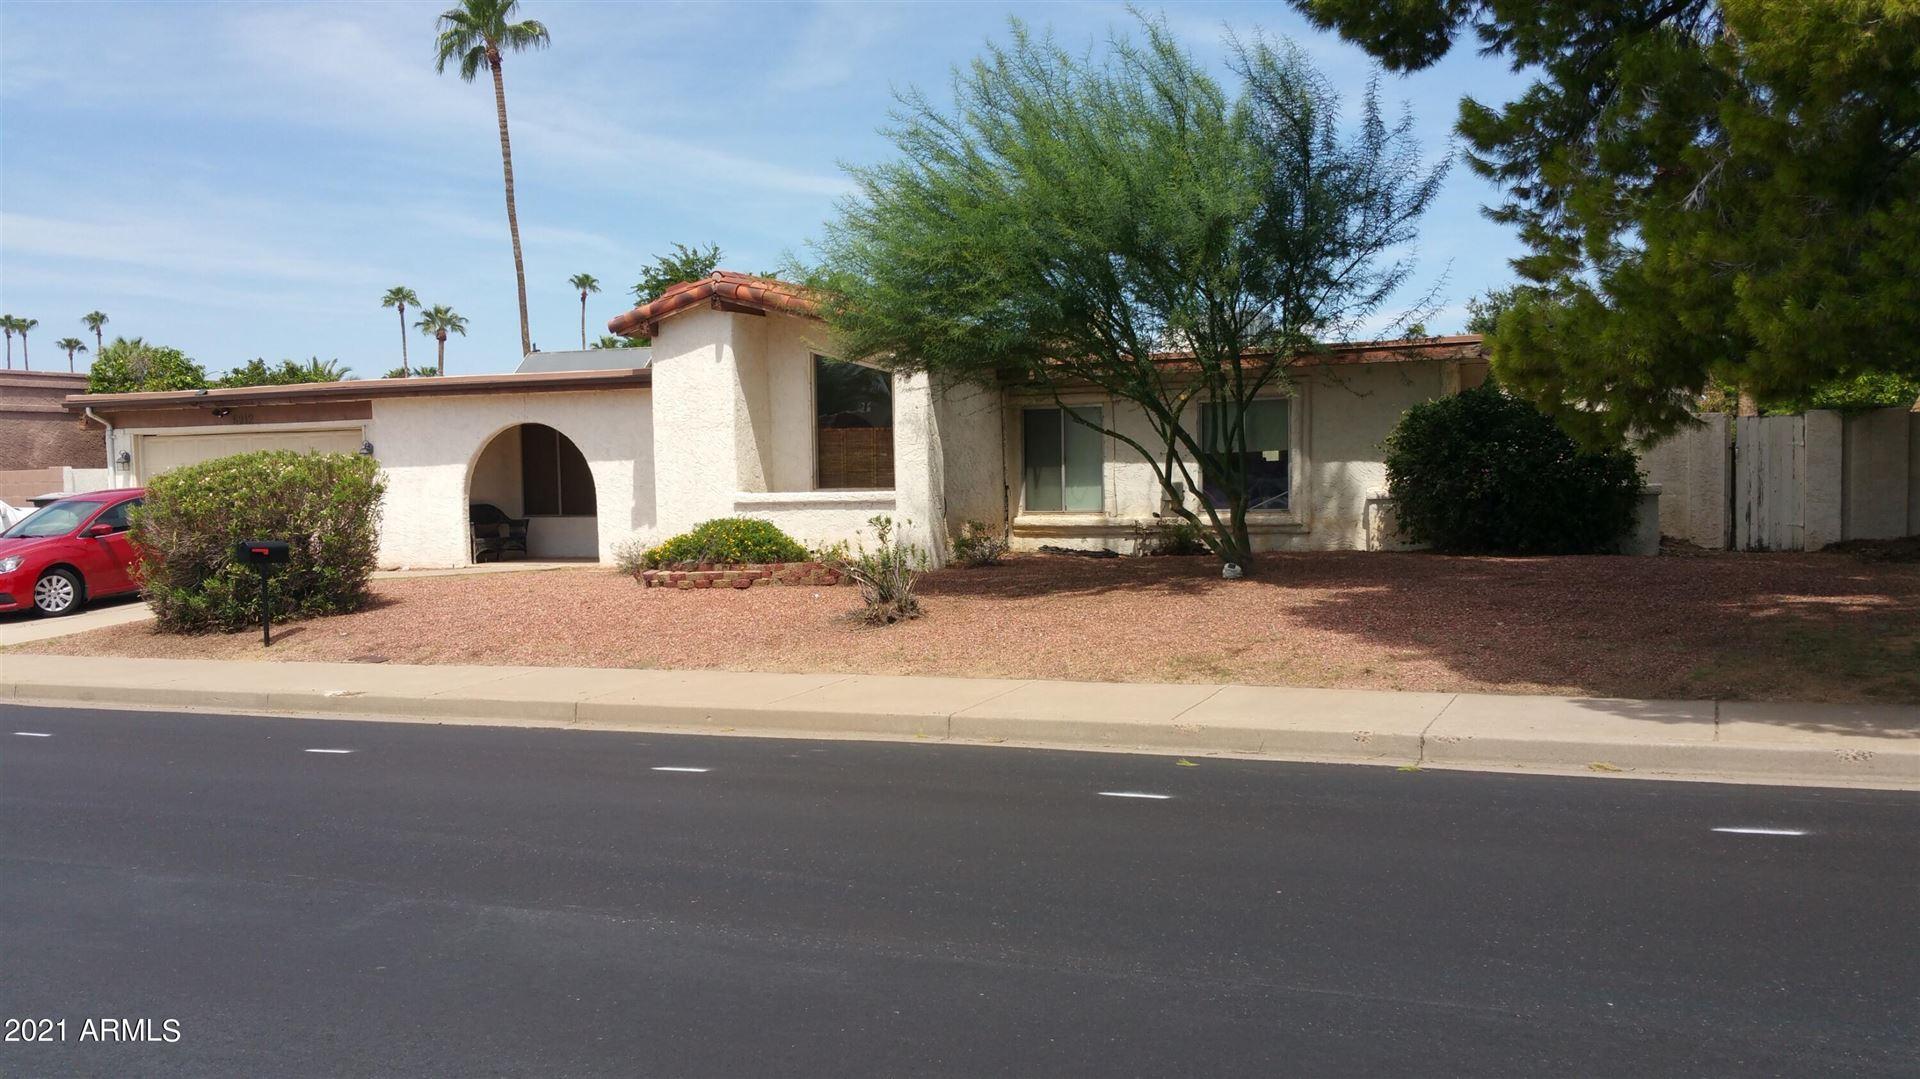 6912 E THUNDERBIRD Road, Scottsdale, AZ 85254 - MLS#: 6293788